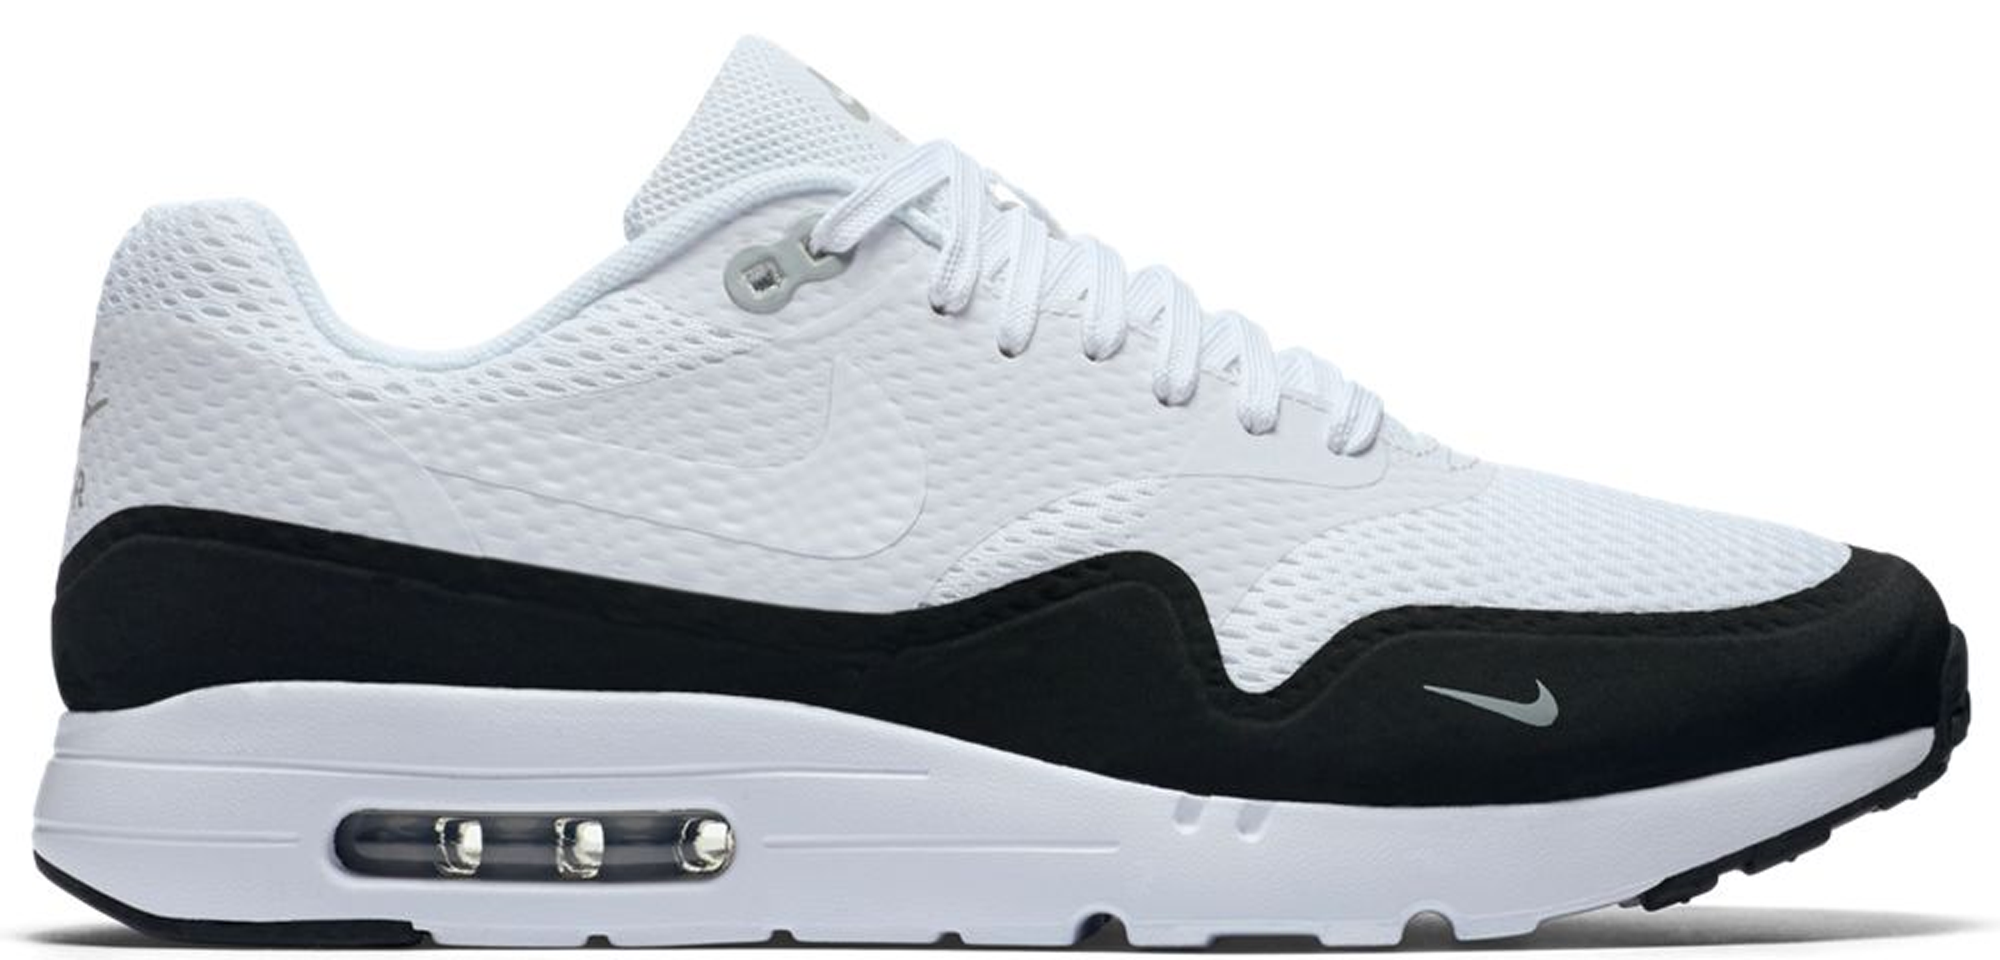 Nike Air Max 1 Ultra White Black